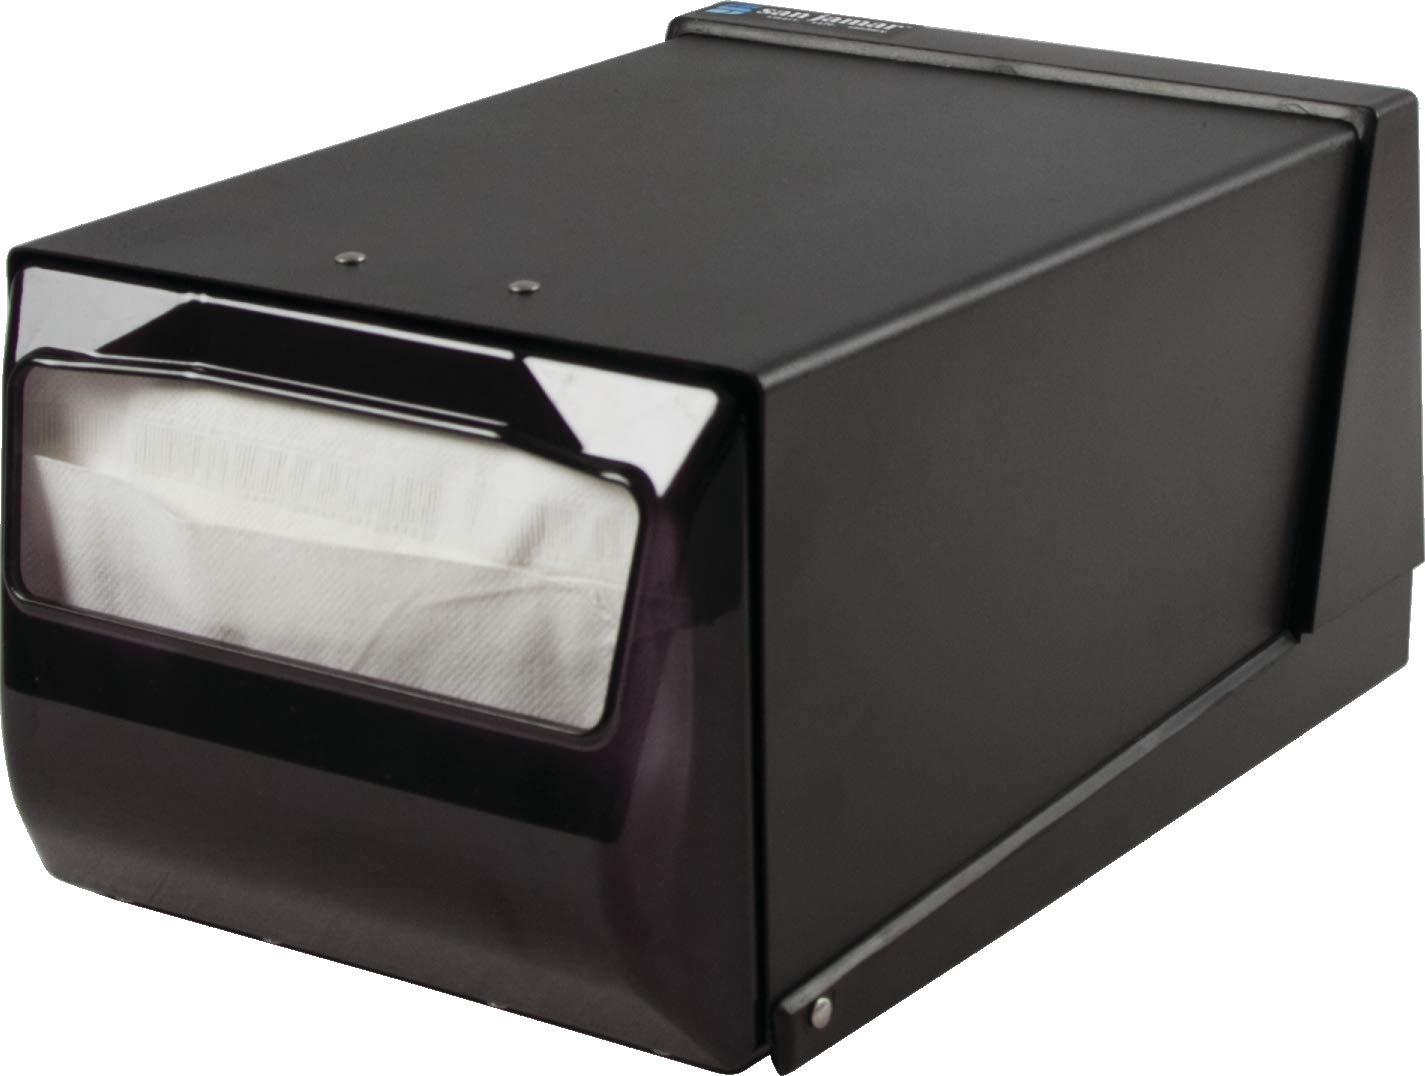 San Jamar H3001 Countertop Fullfold Napkin Dispenser, 300 Capacity, 7-5/8'' Width x 5-1/2'' Height x 11'' Depth, Black Pearl/Black by San Jamar